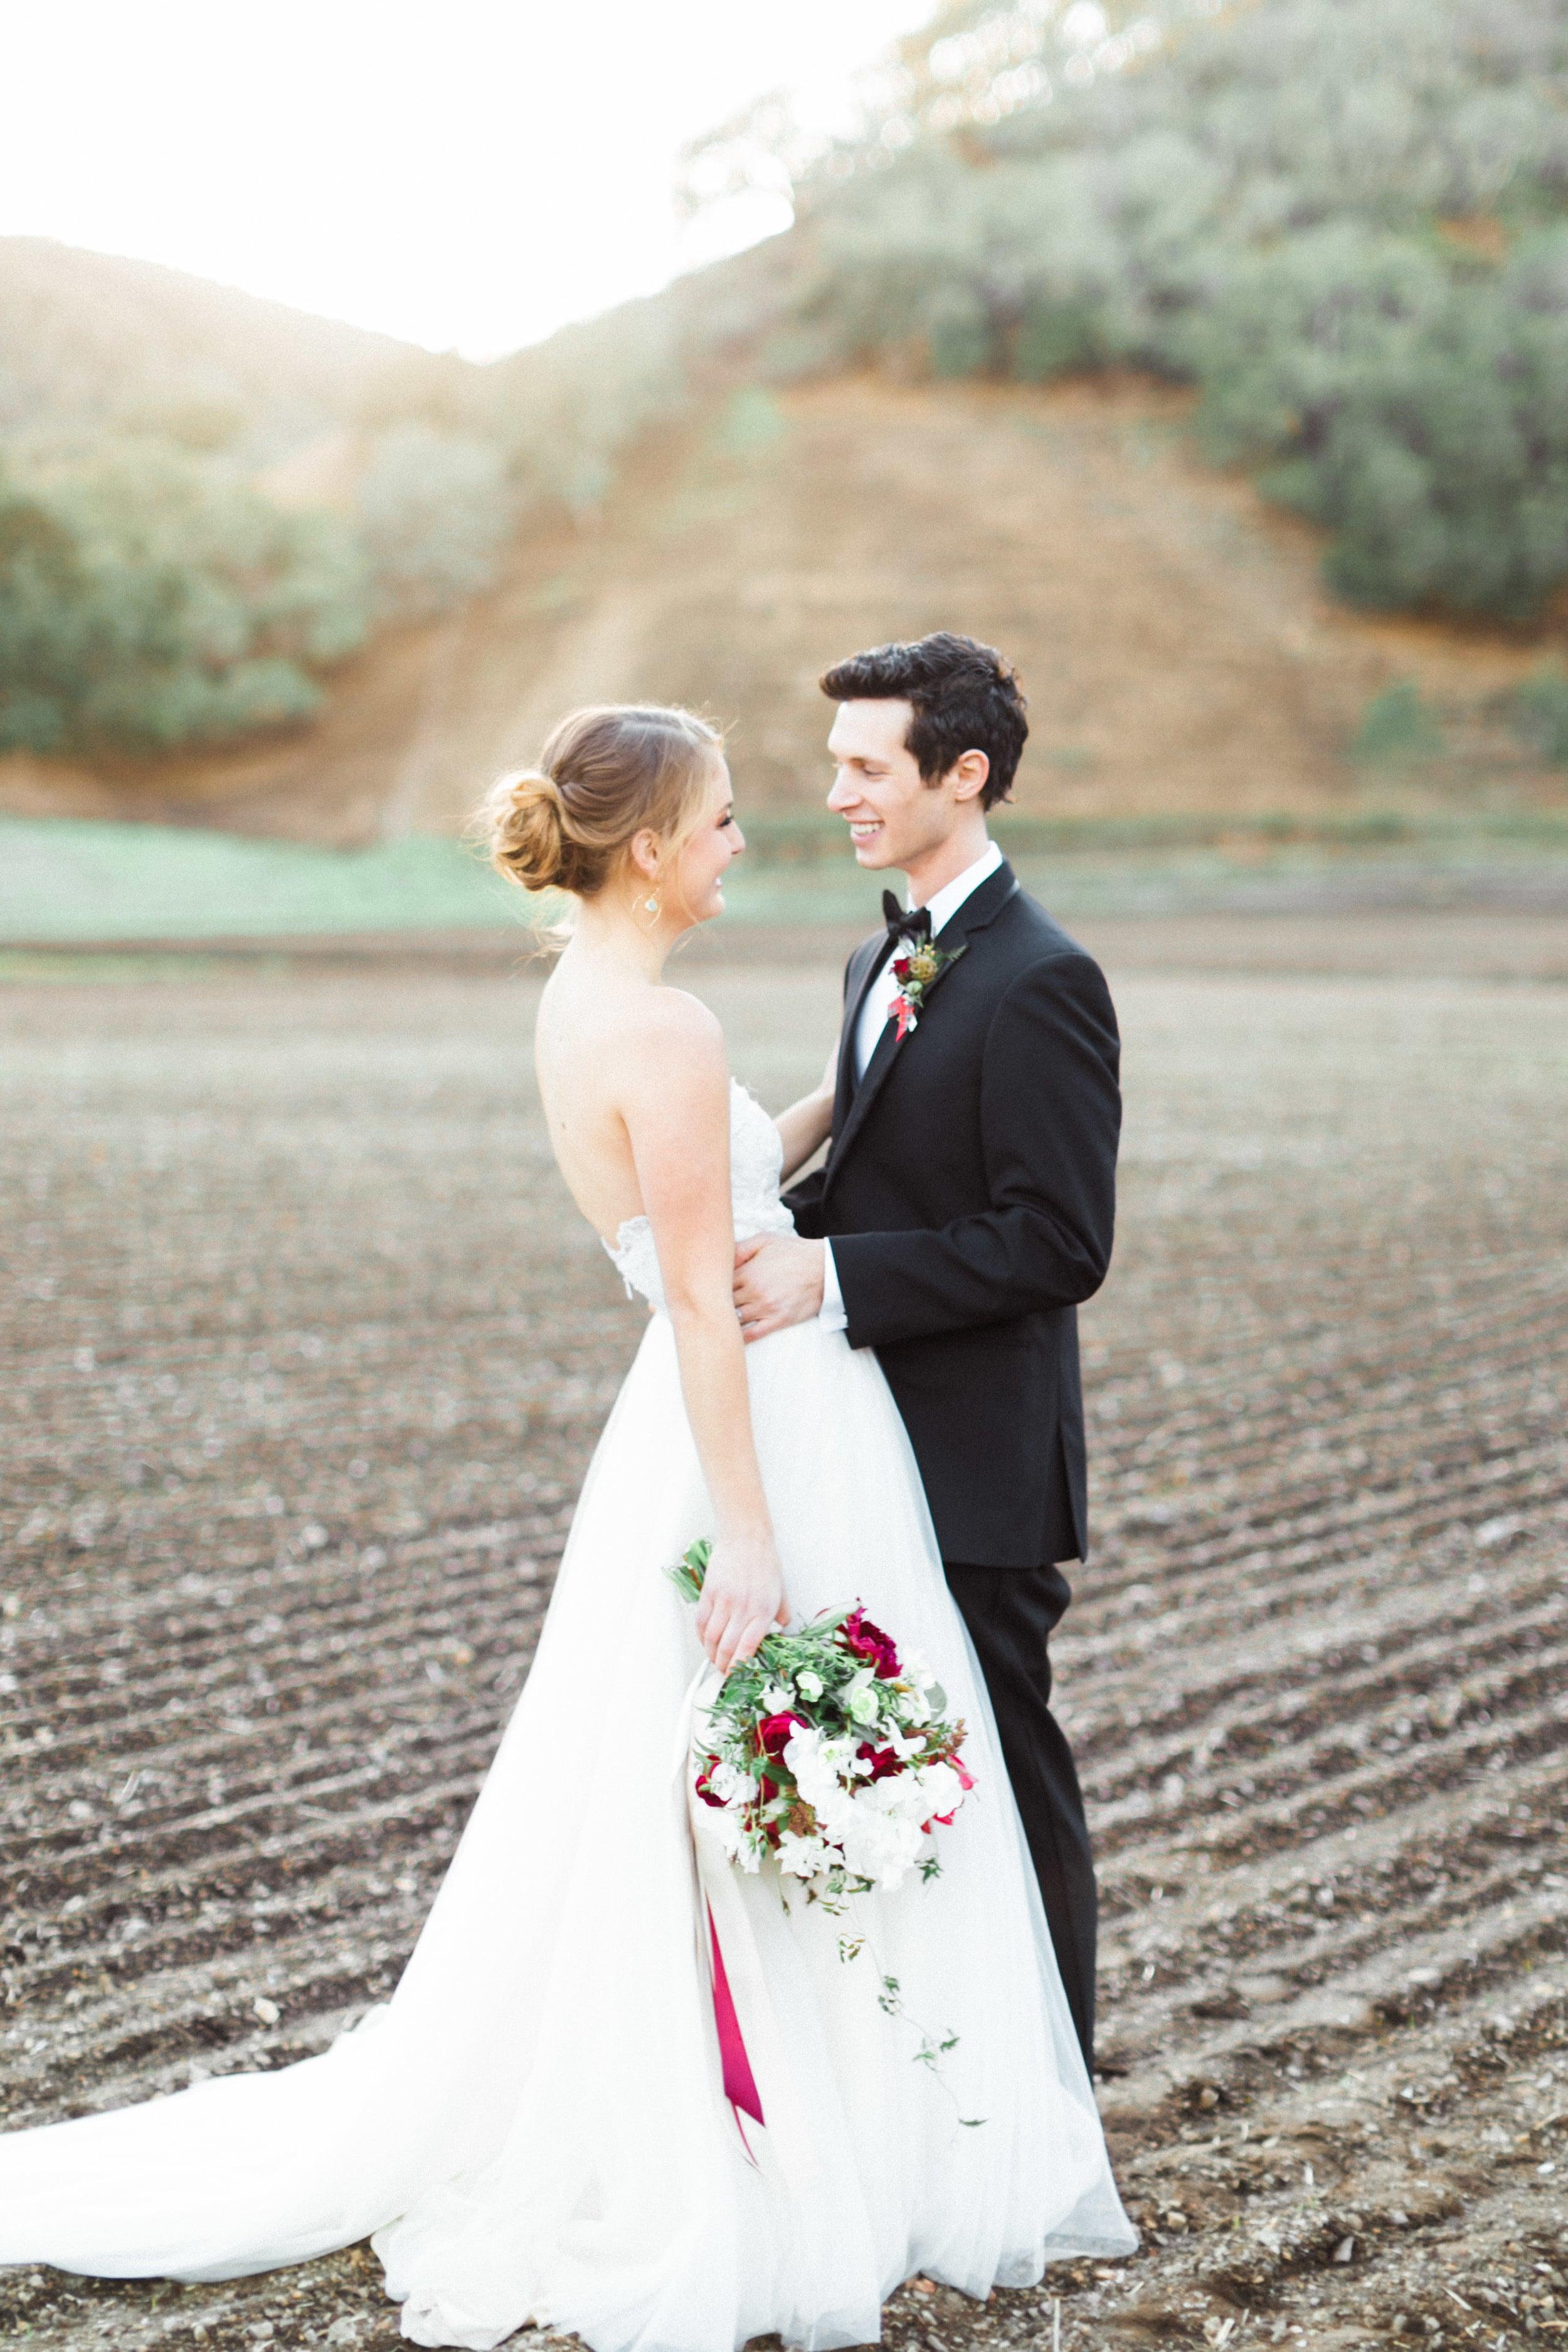 Natalie_Schutt_Photography_Winter_Wedding_San_Luis_Obispo-197.jpg